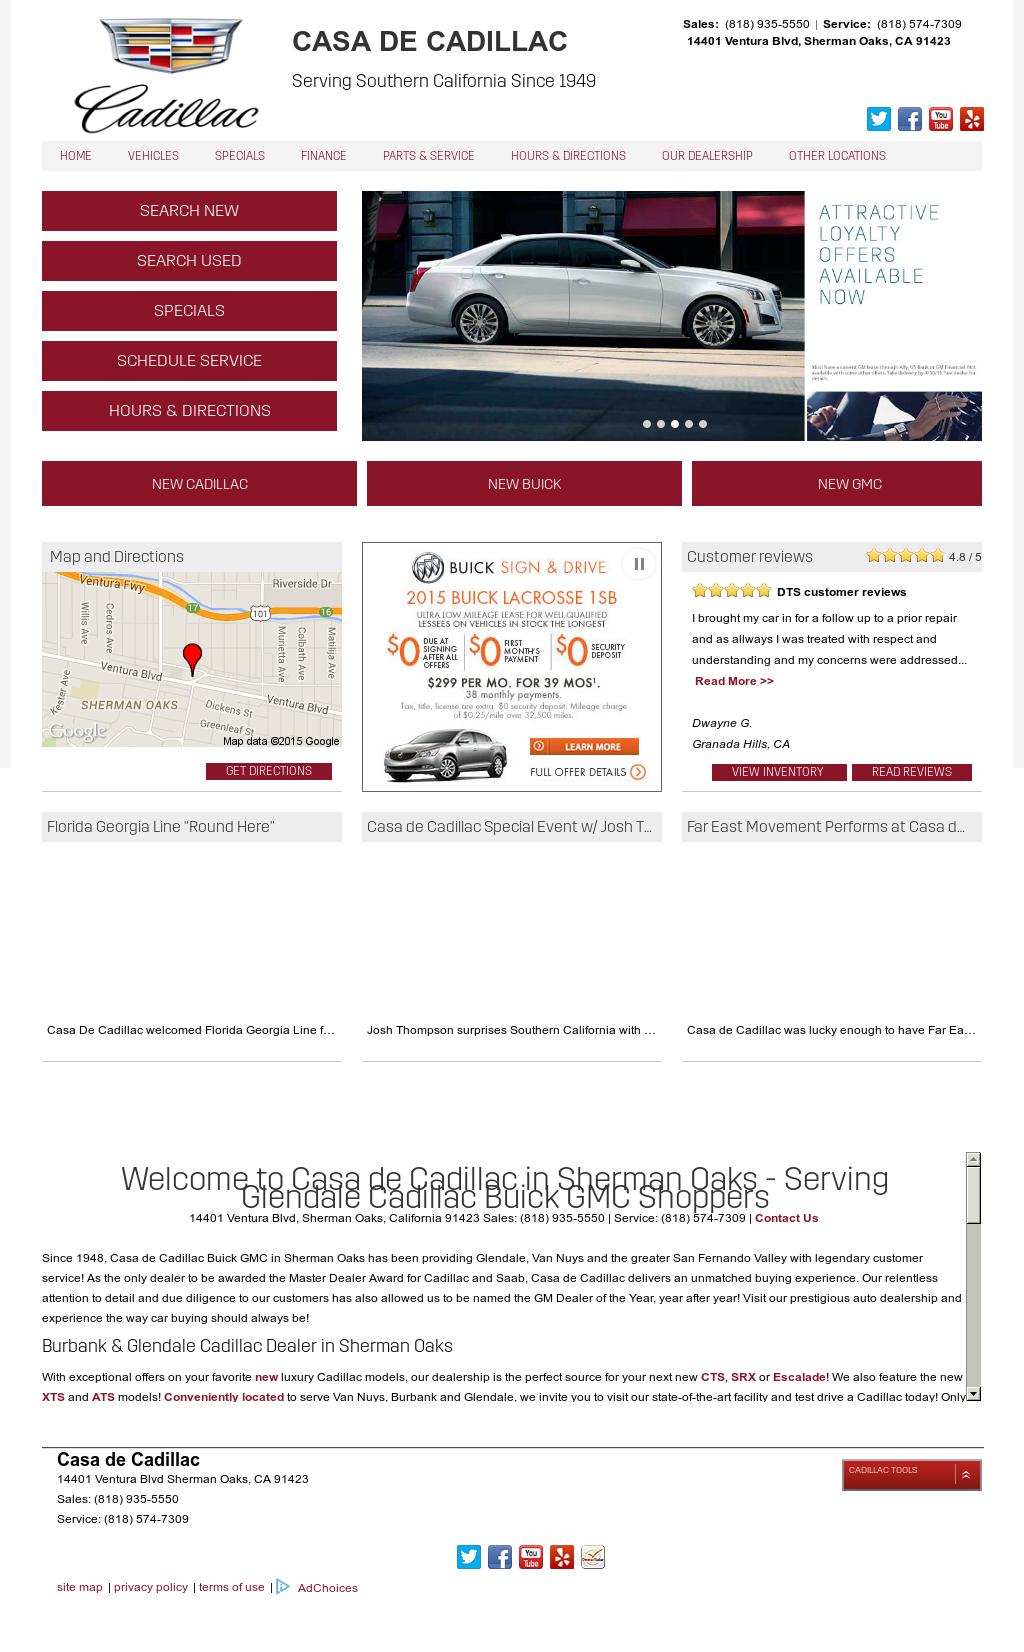 Casa De Cadillac Competitors Revenue And Employees Owler Company